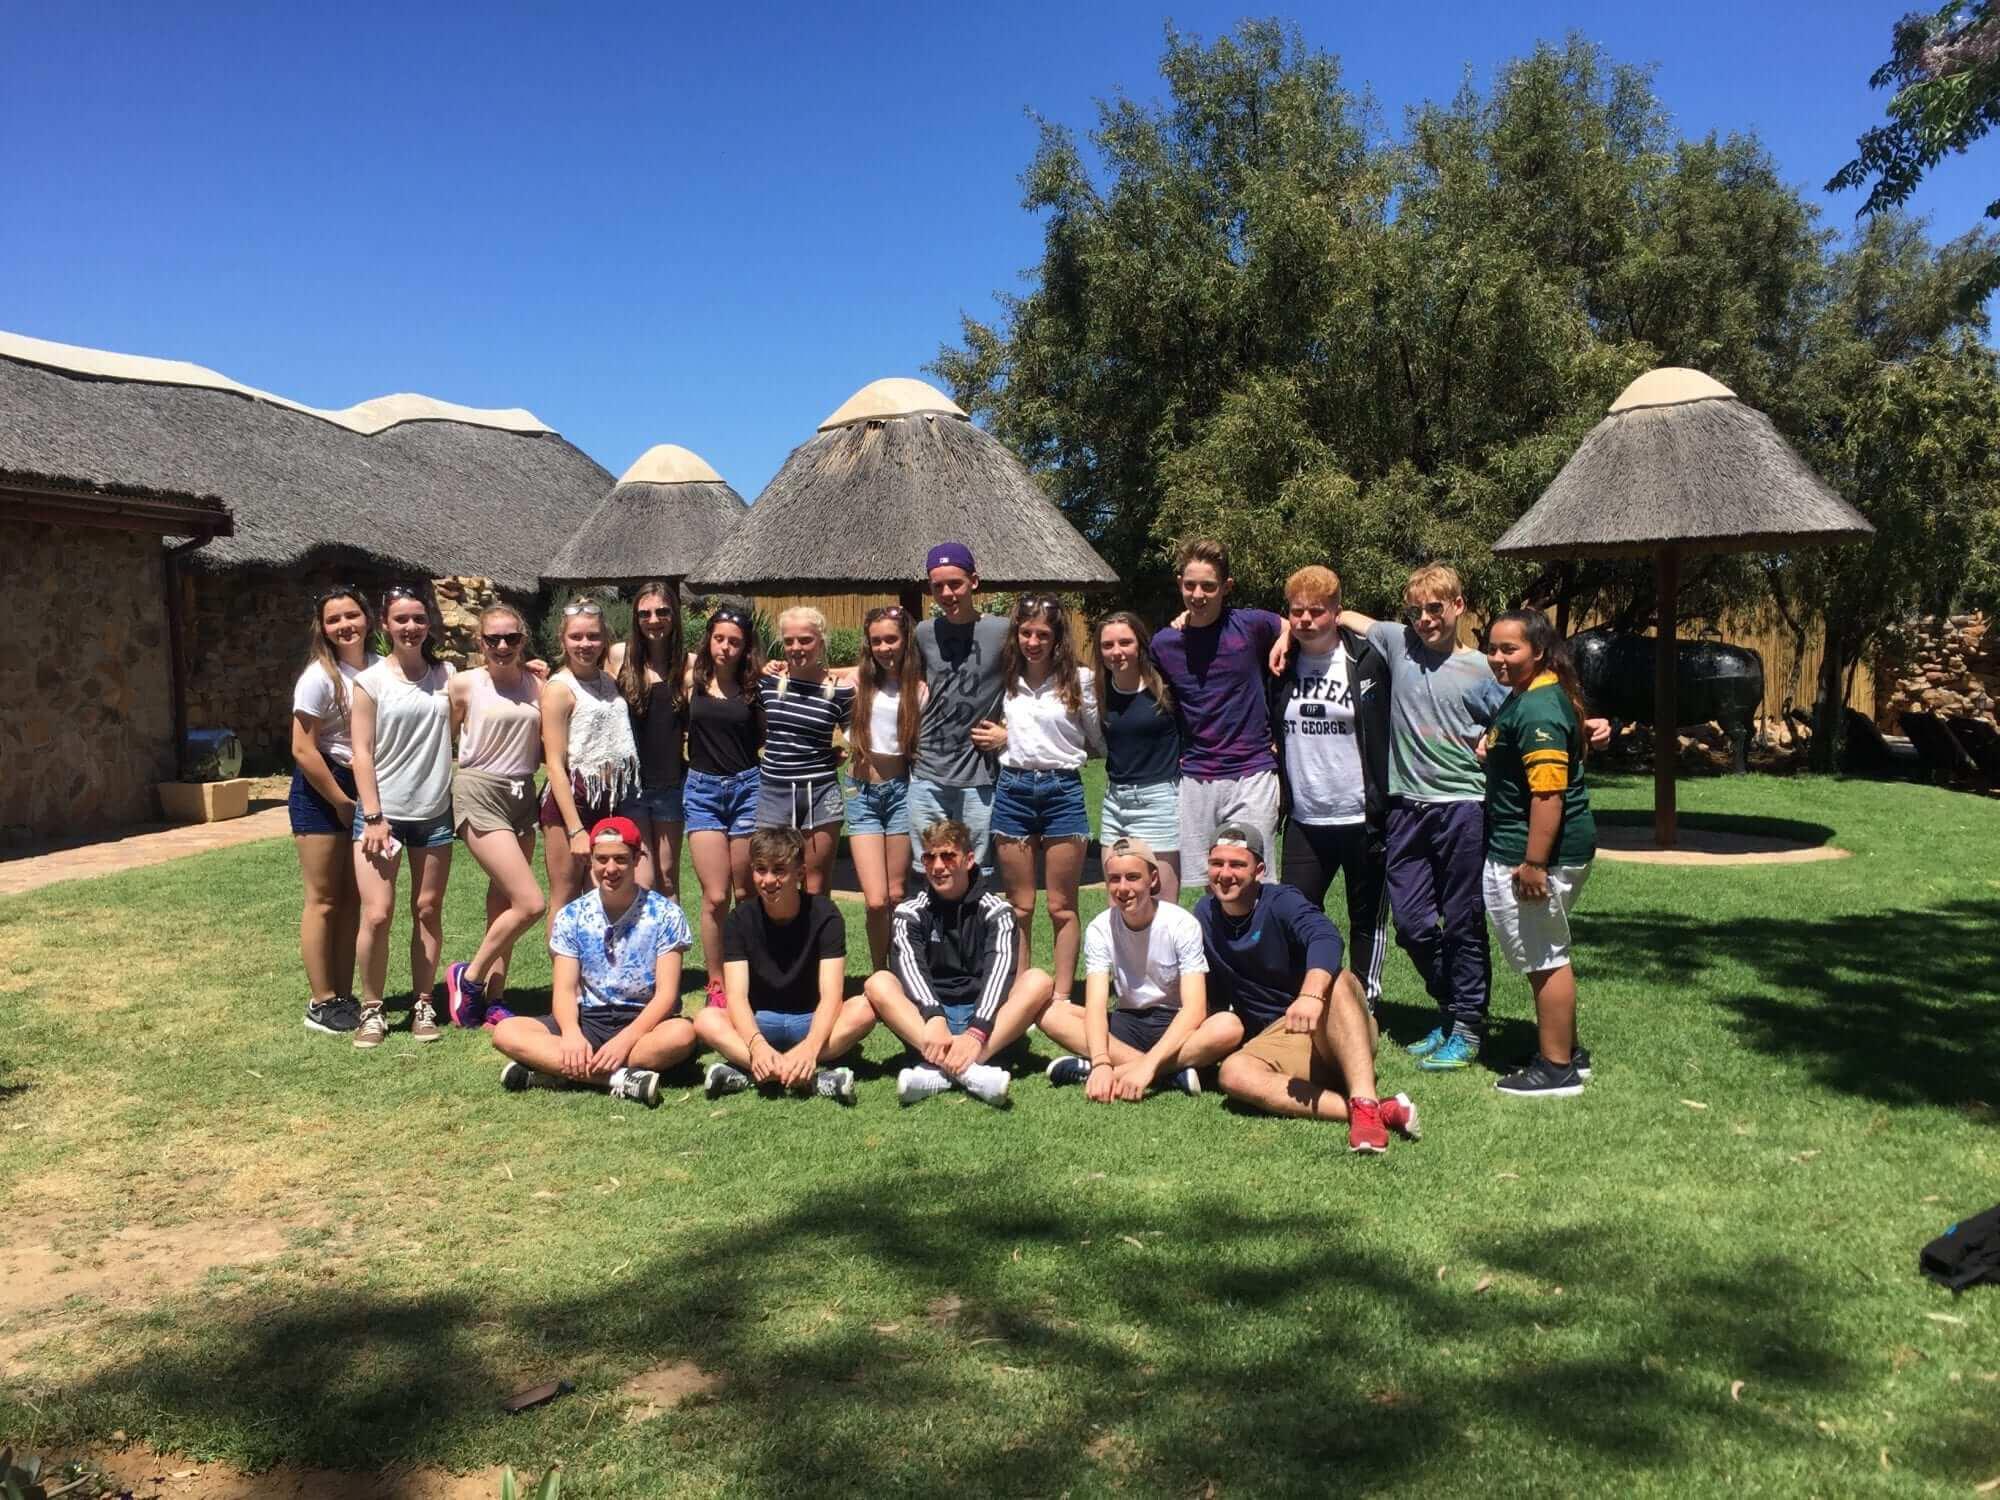 inspiresport South Africa sportstour